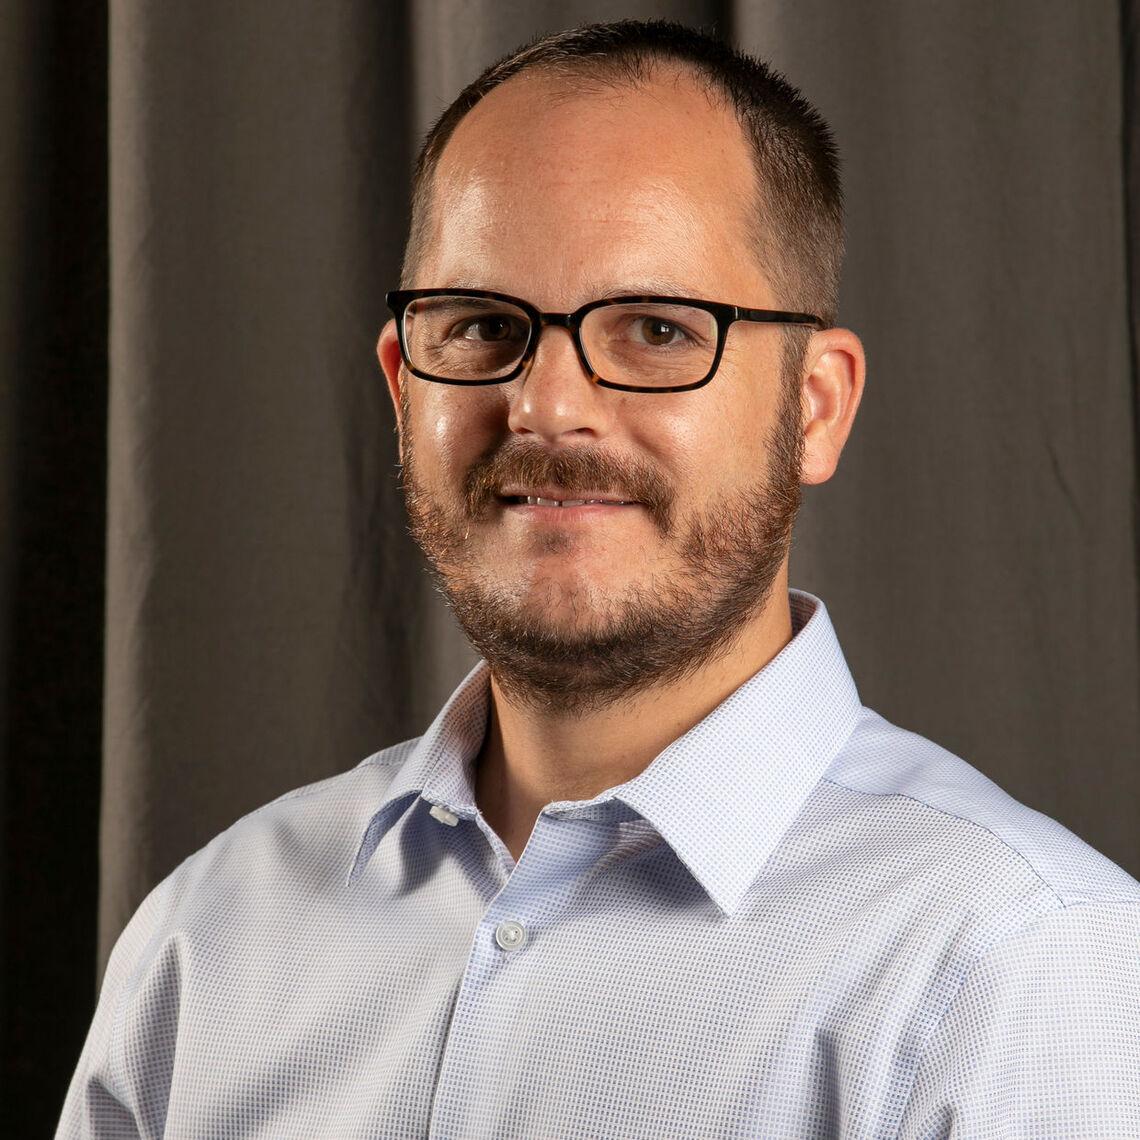 Assistant Professor of Mathematics Nicholas Baeth